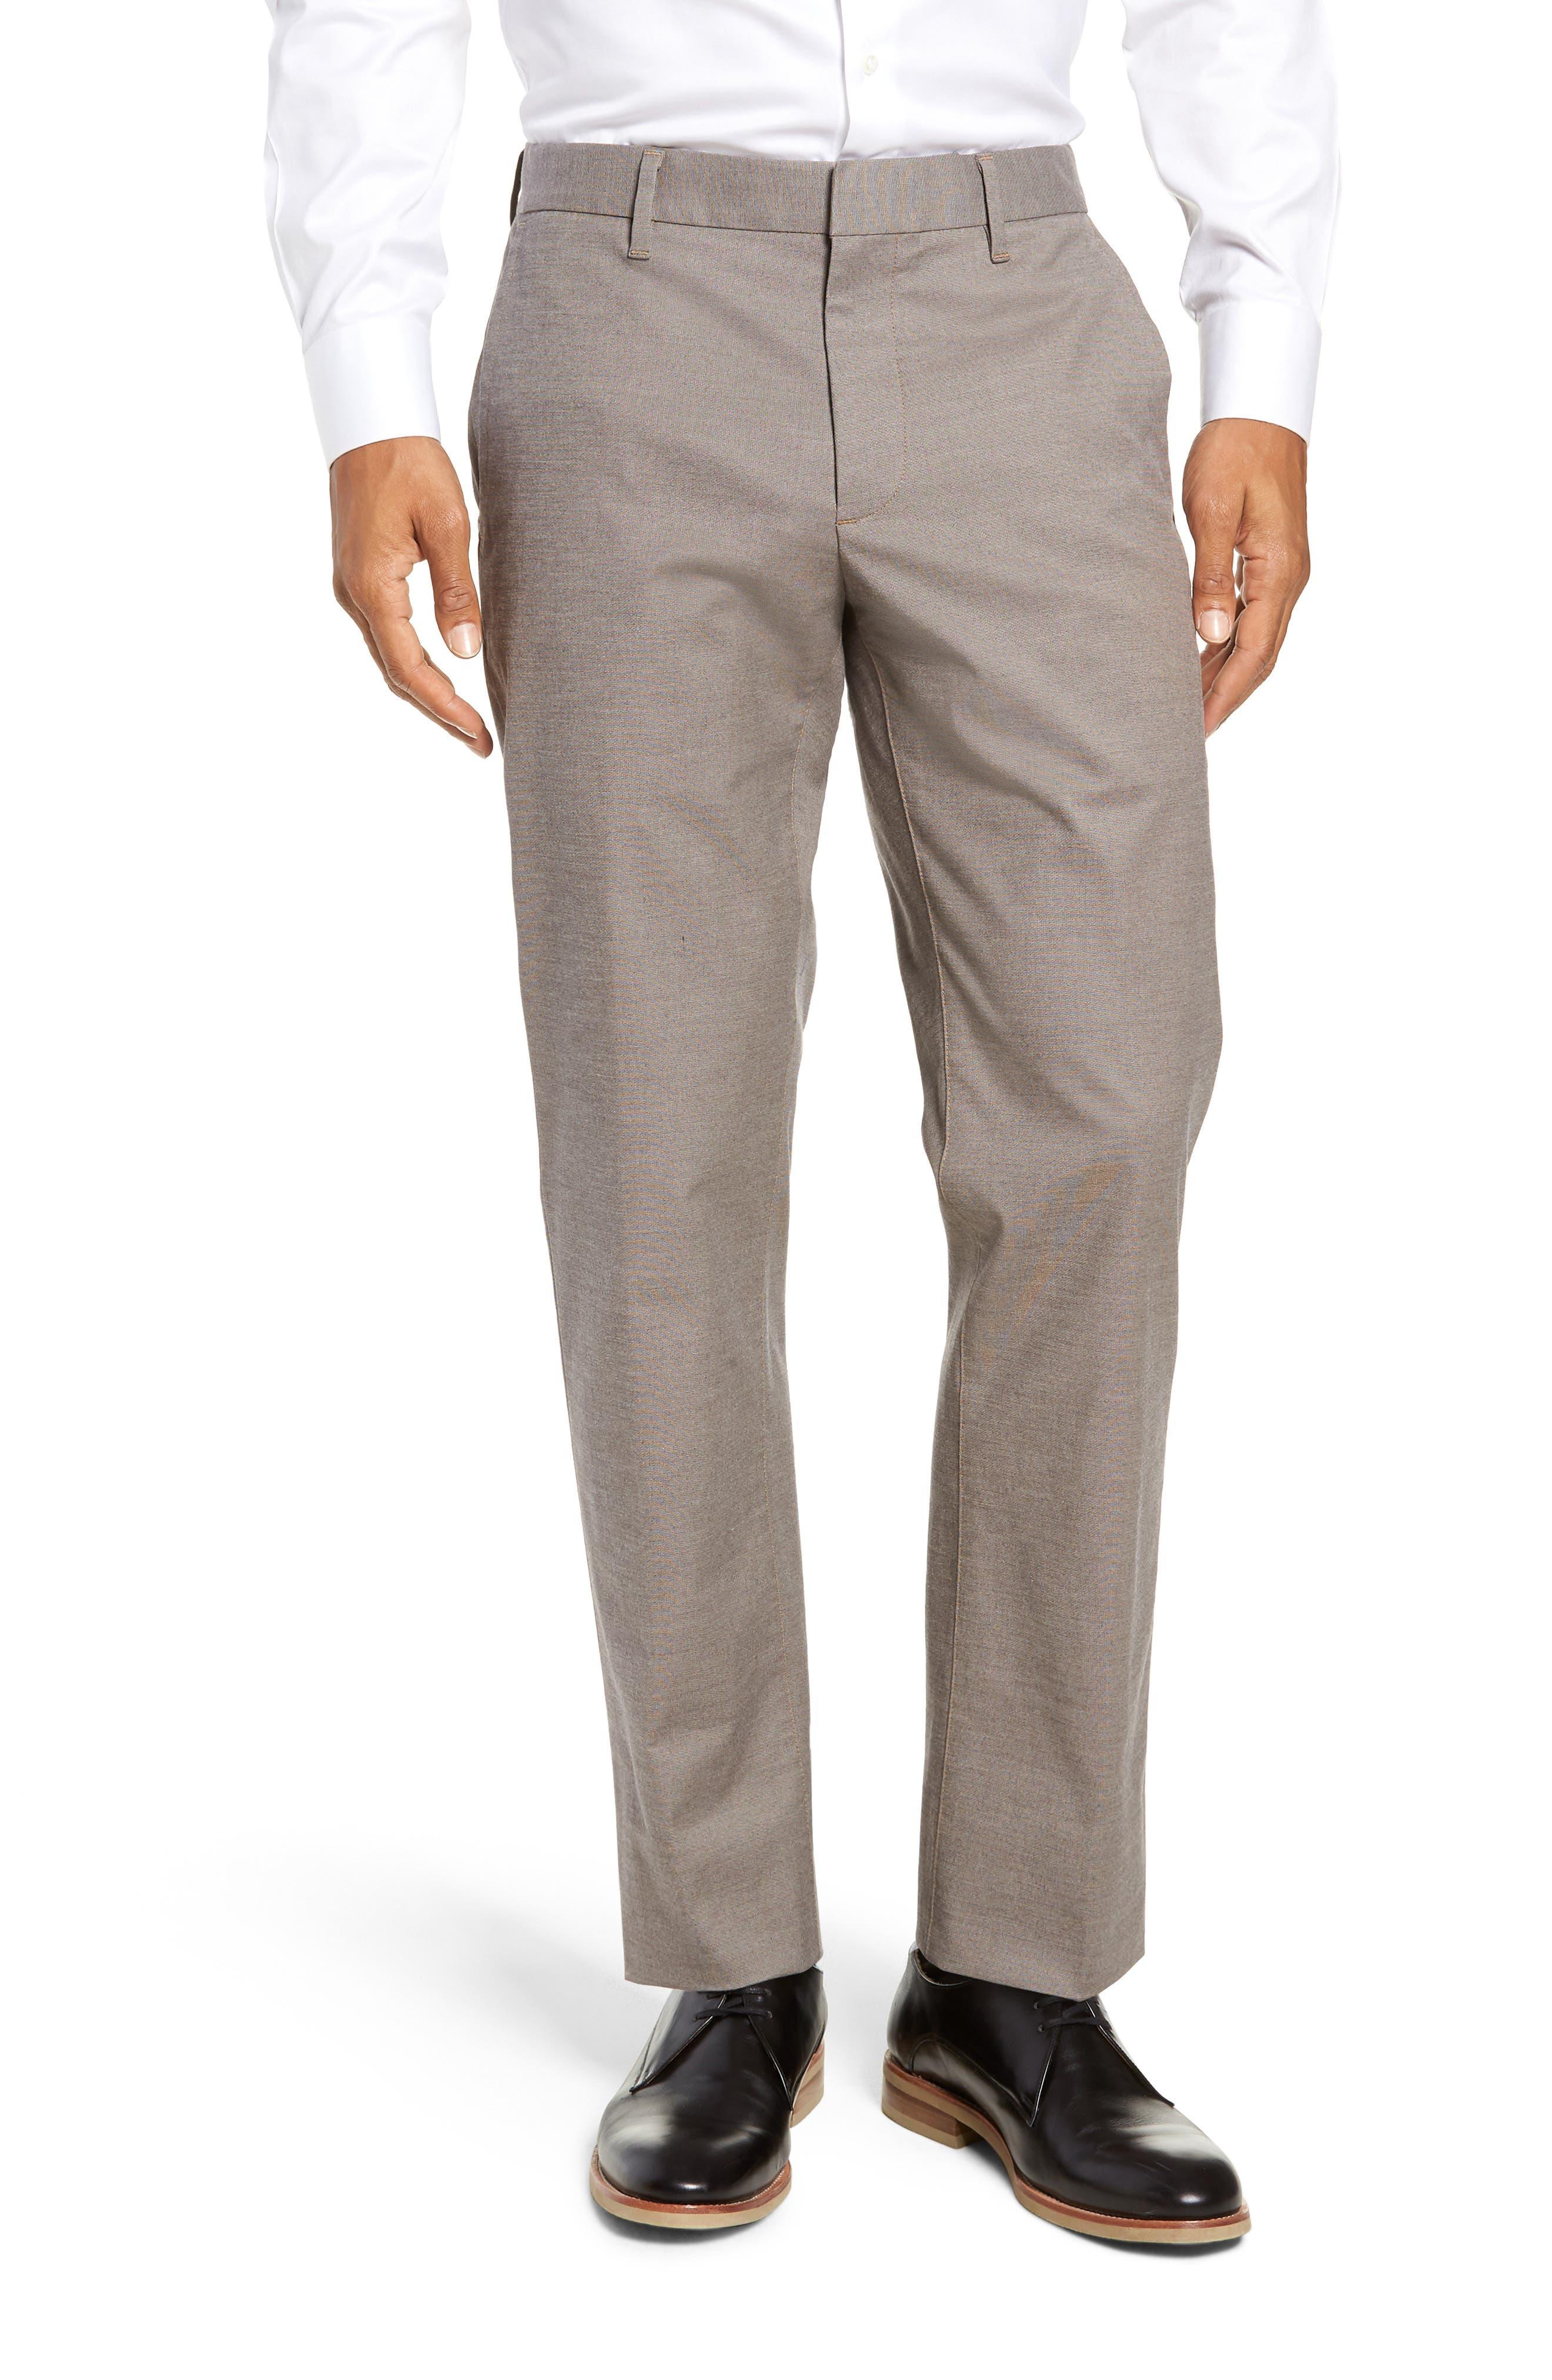 BONOBOS, Weekday Warrior Slim Fit Stretch Dress Pants, Main thumbnail 1, color, LIGHT KHAKI YARN DYE